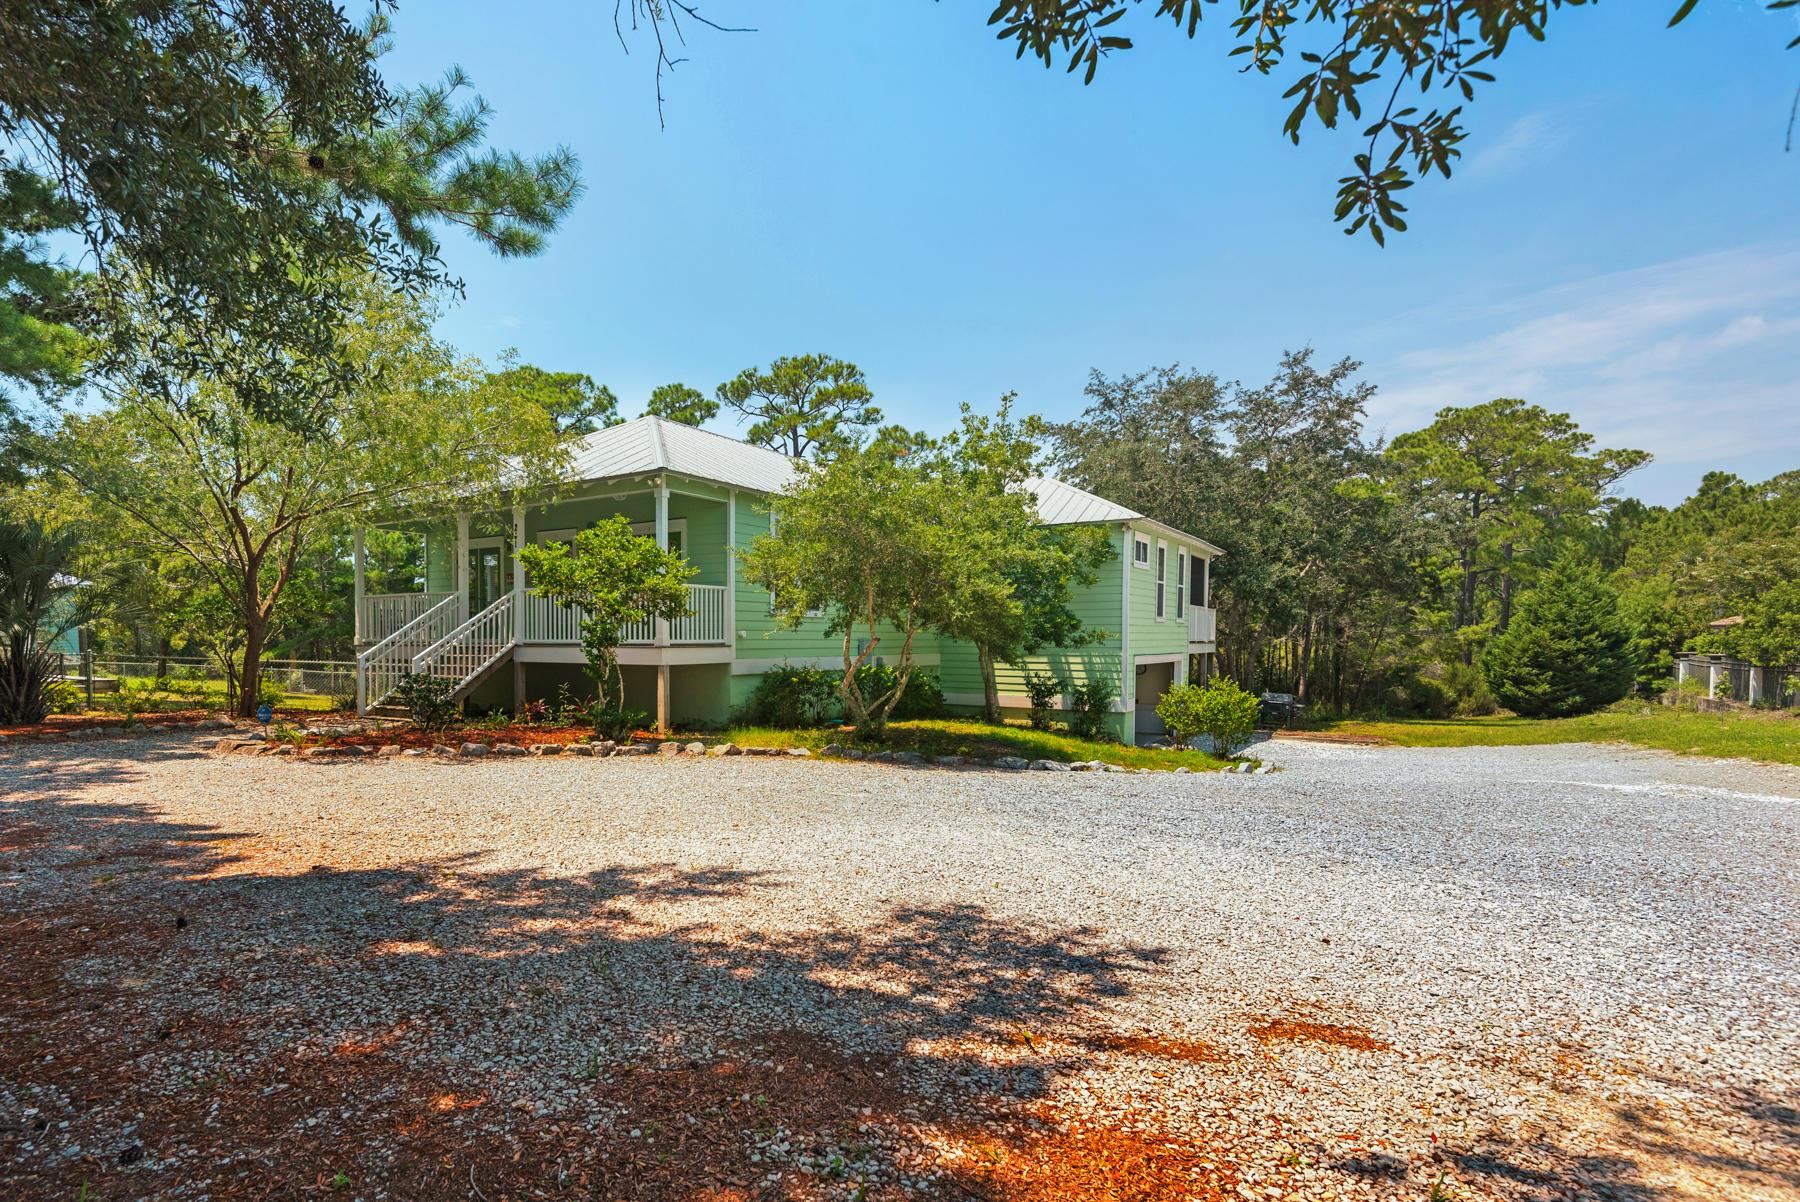 Photo of home for sale at 241 Satinwood, Santa Rosa Beach FL